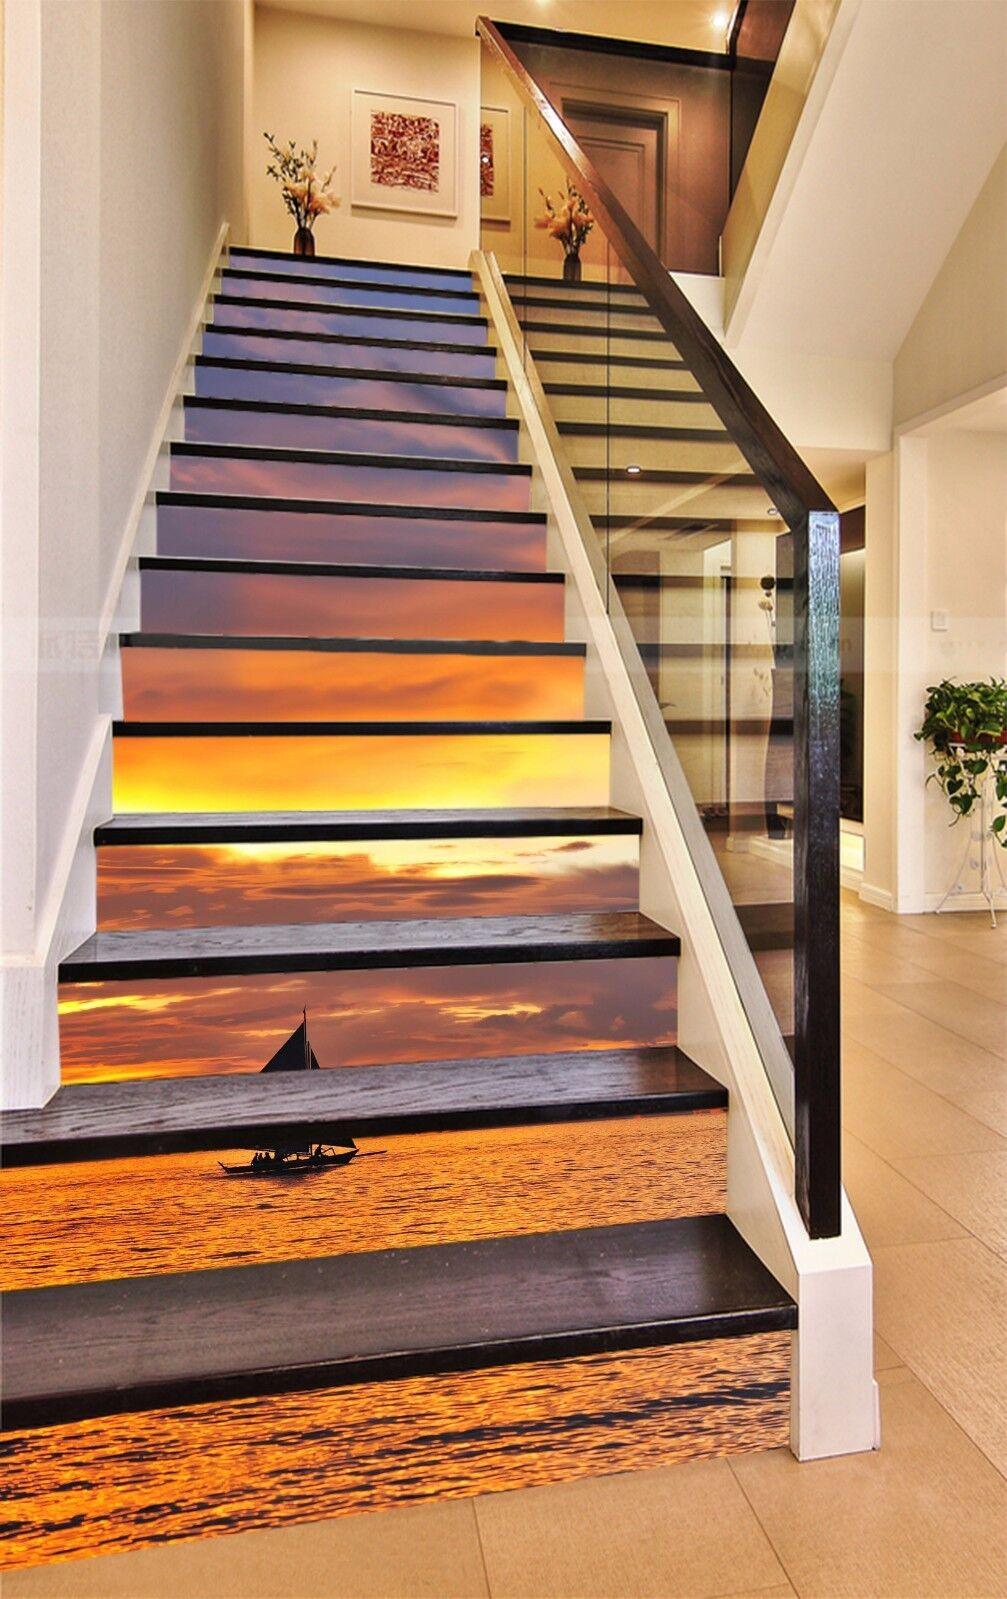 3D Sailboat Sea 327 Stair Risers Decoration Photo Mural Vinyl Decal Wallpaper AU